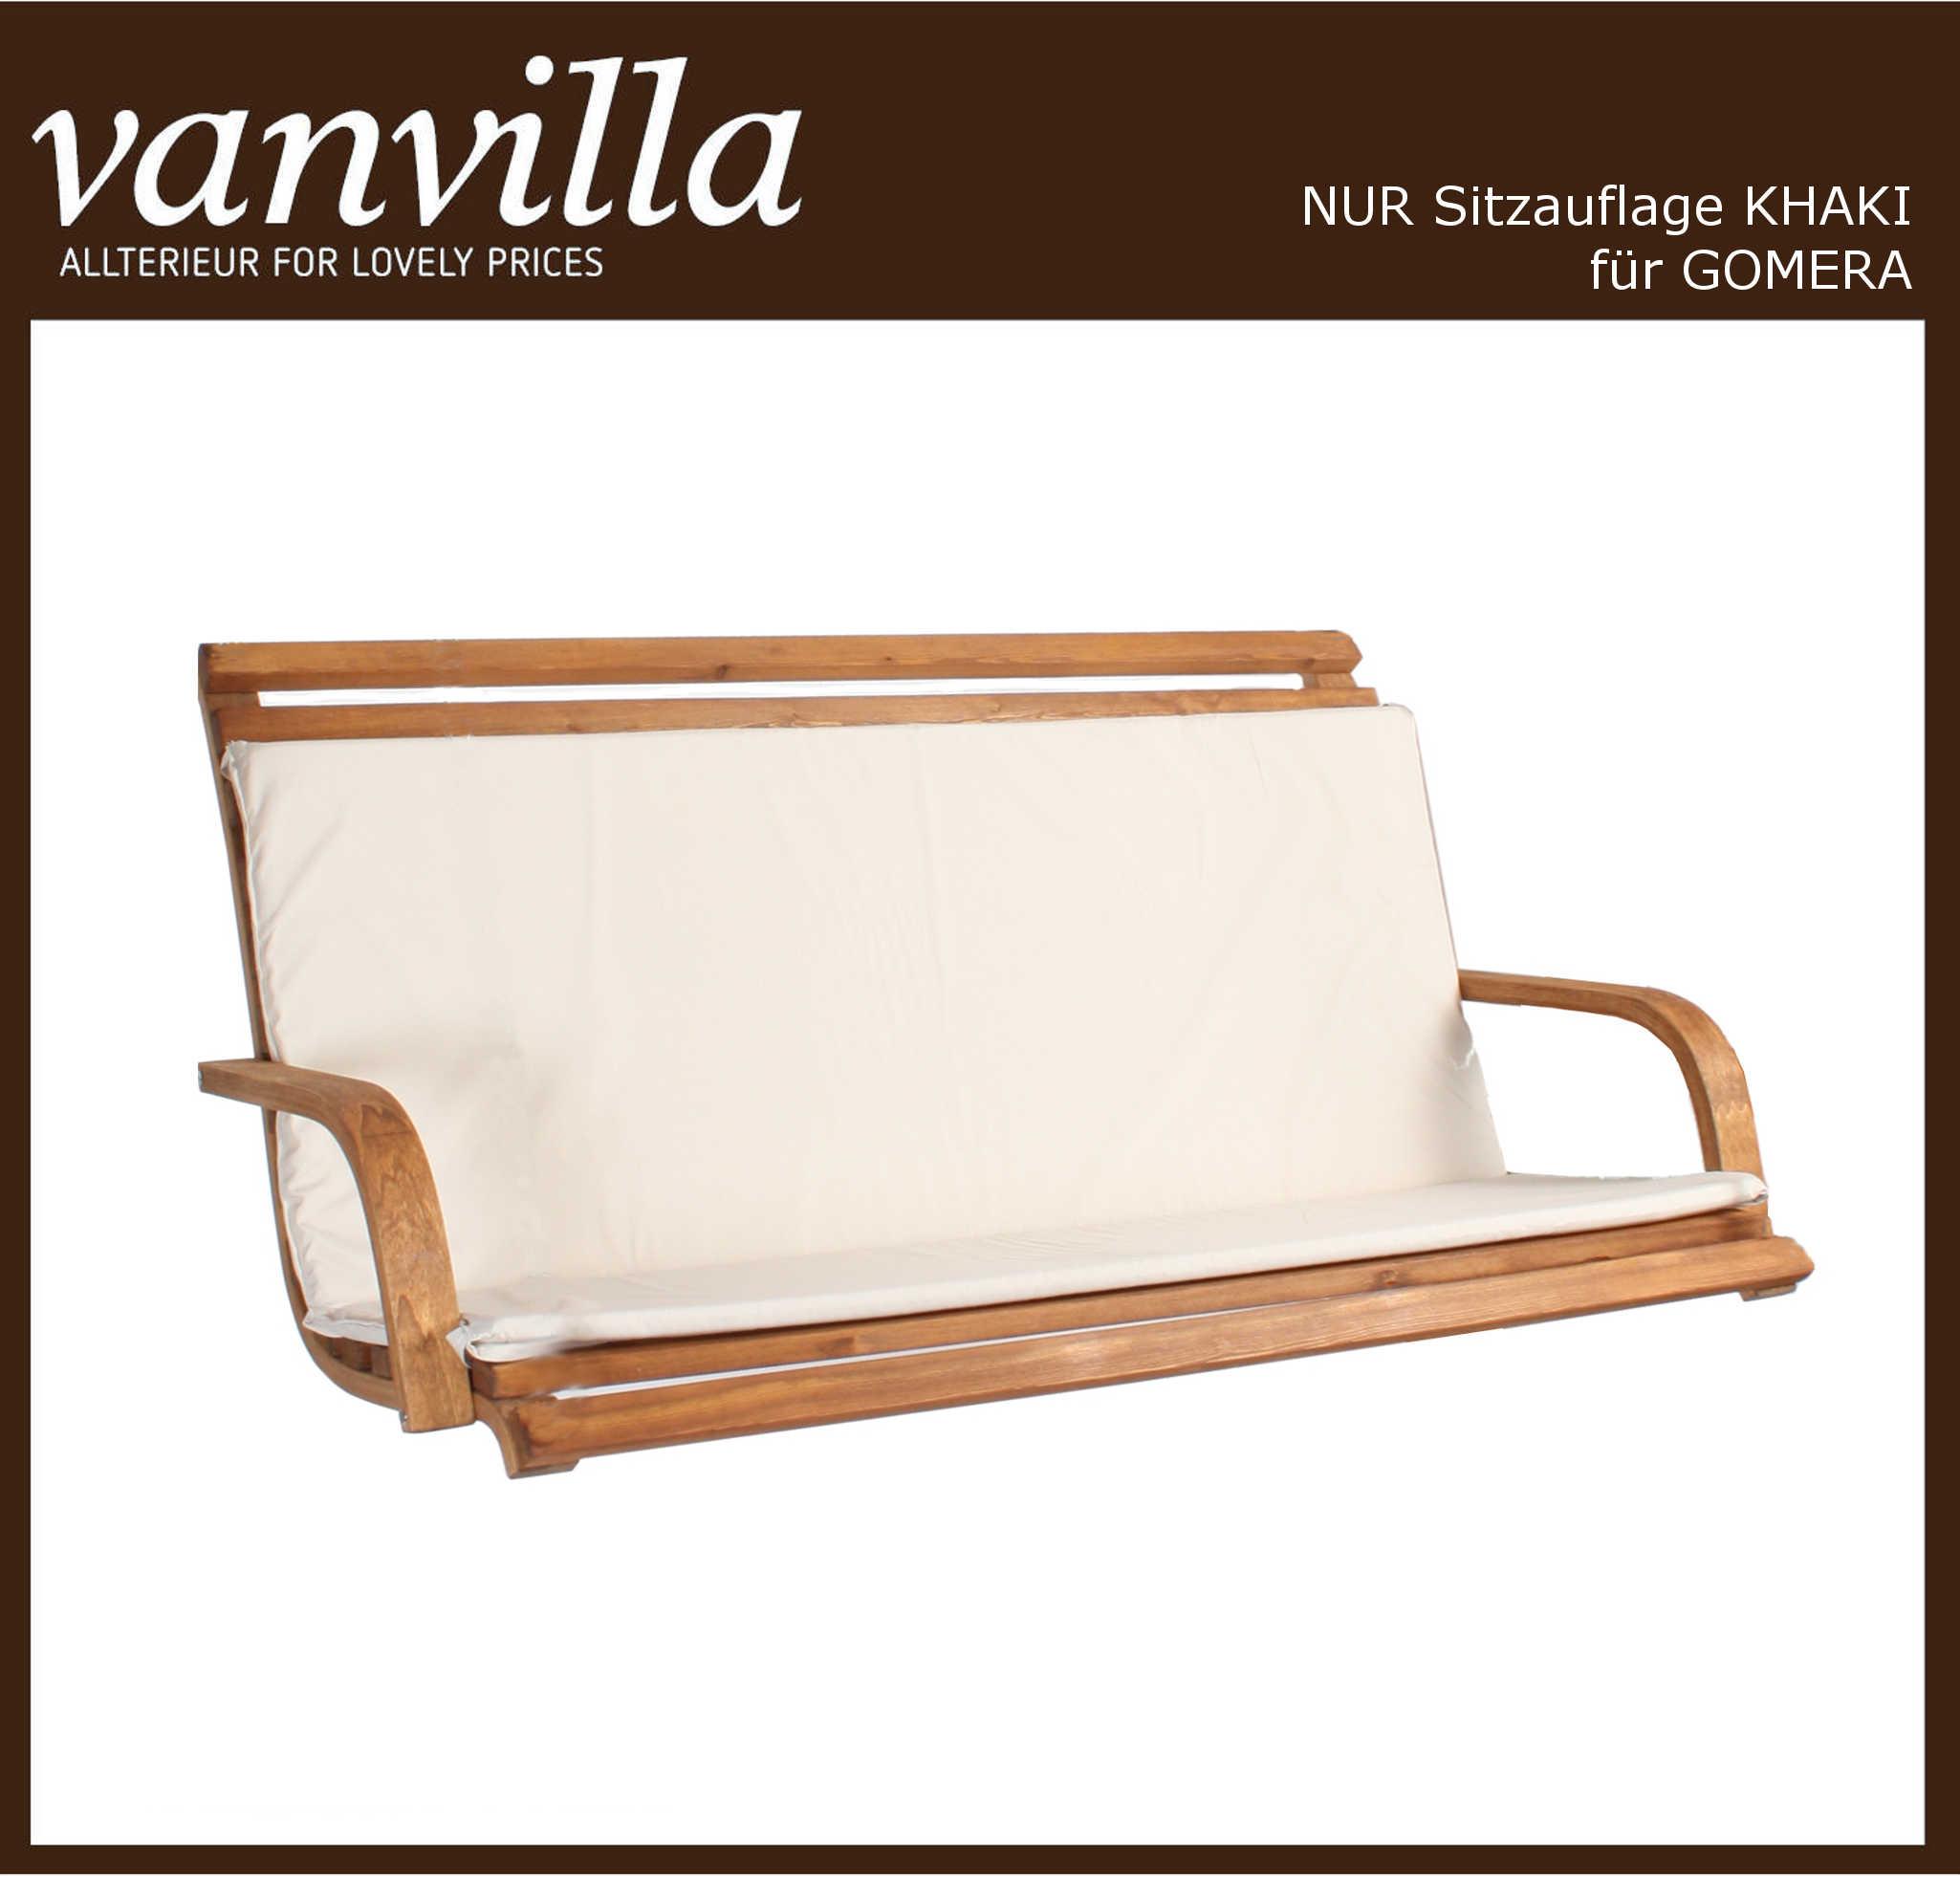 vanvilla Polsterauflage für Hollywoodschaukel Modell Gomera, Stofffarbe Khaki